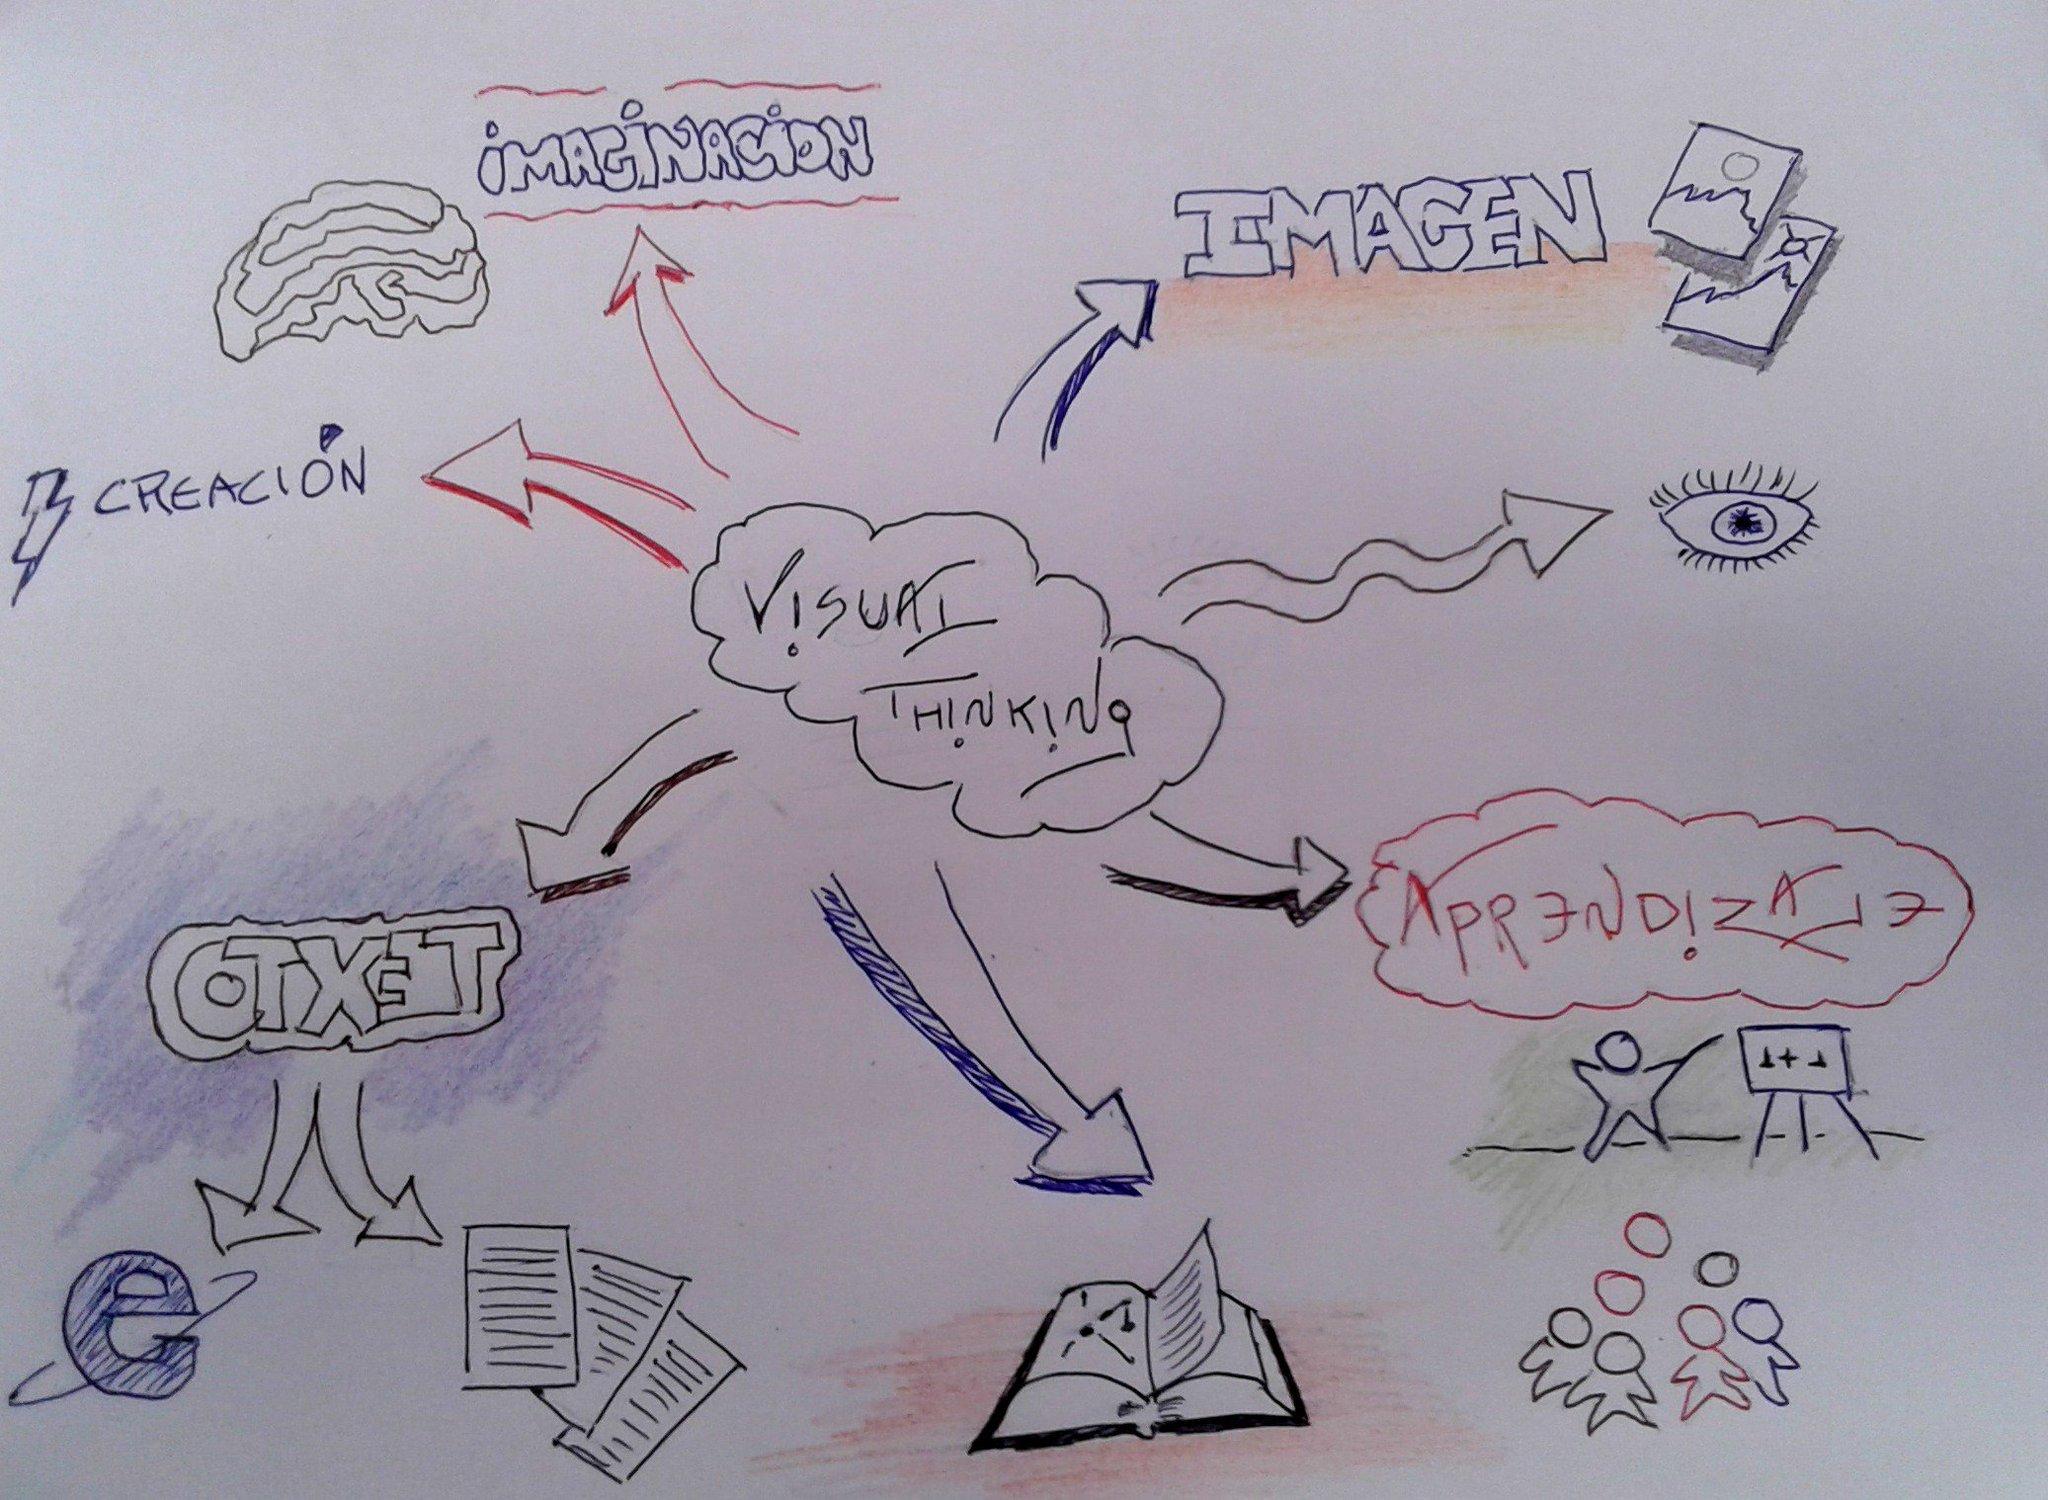 Mi reto Terminado #PensarVisual  #nooc #INTEF #VisualThinking https://t.co/tGTDkW0NrC